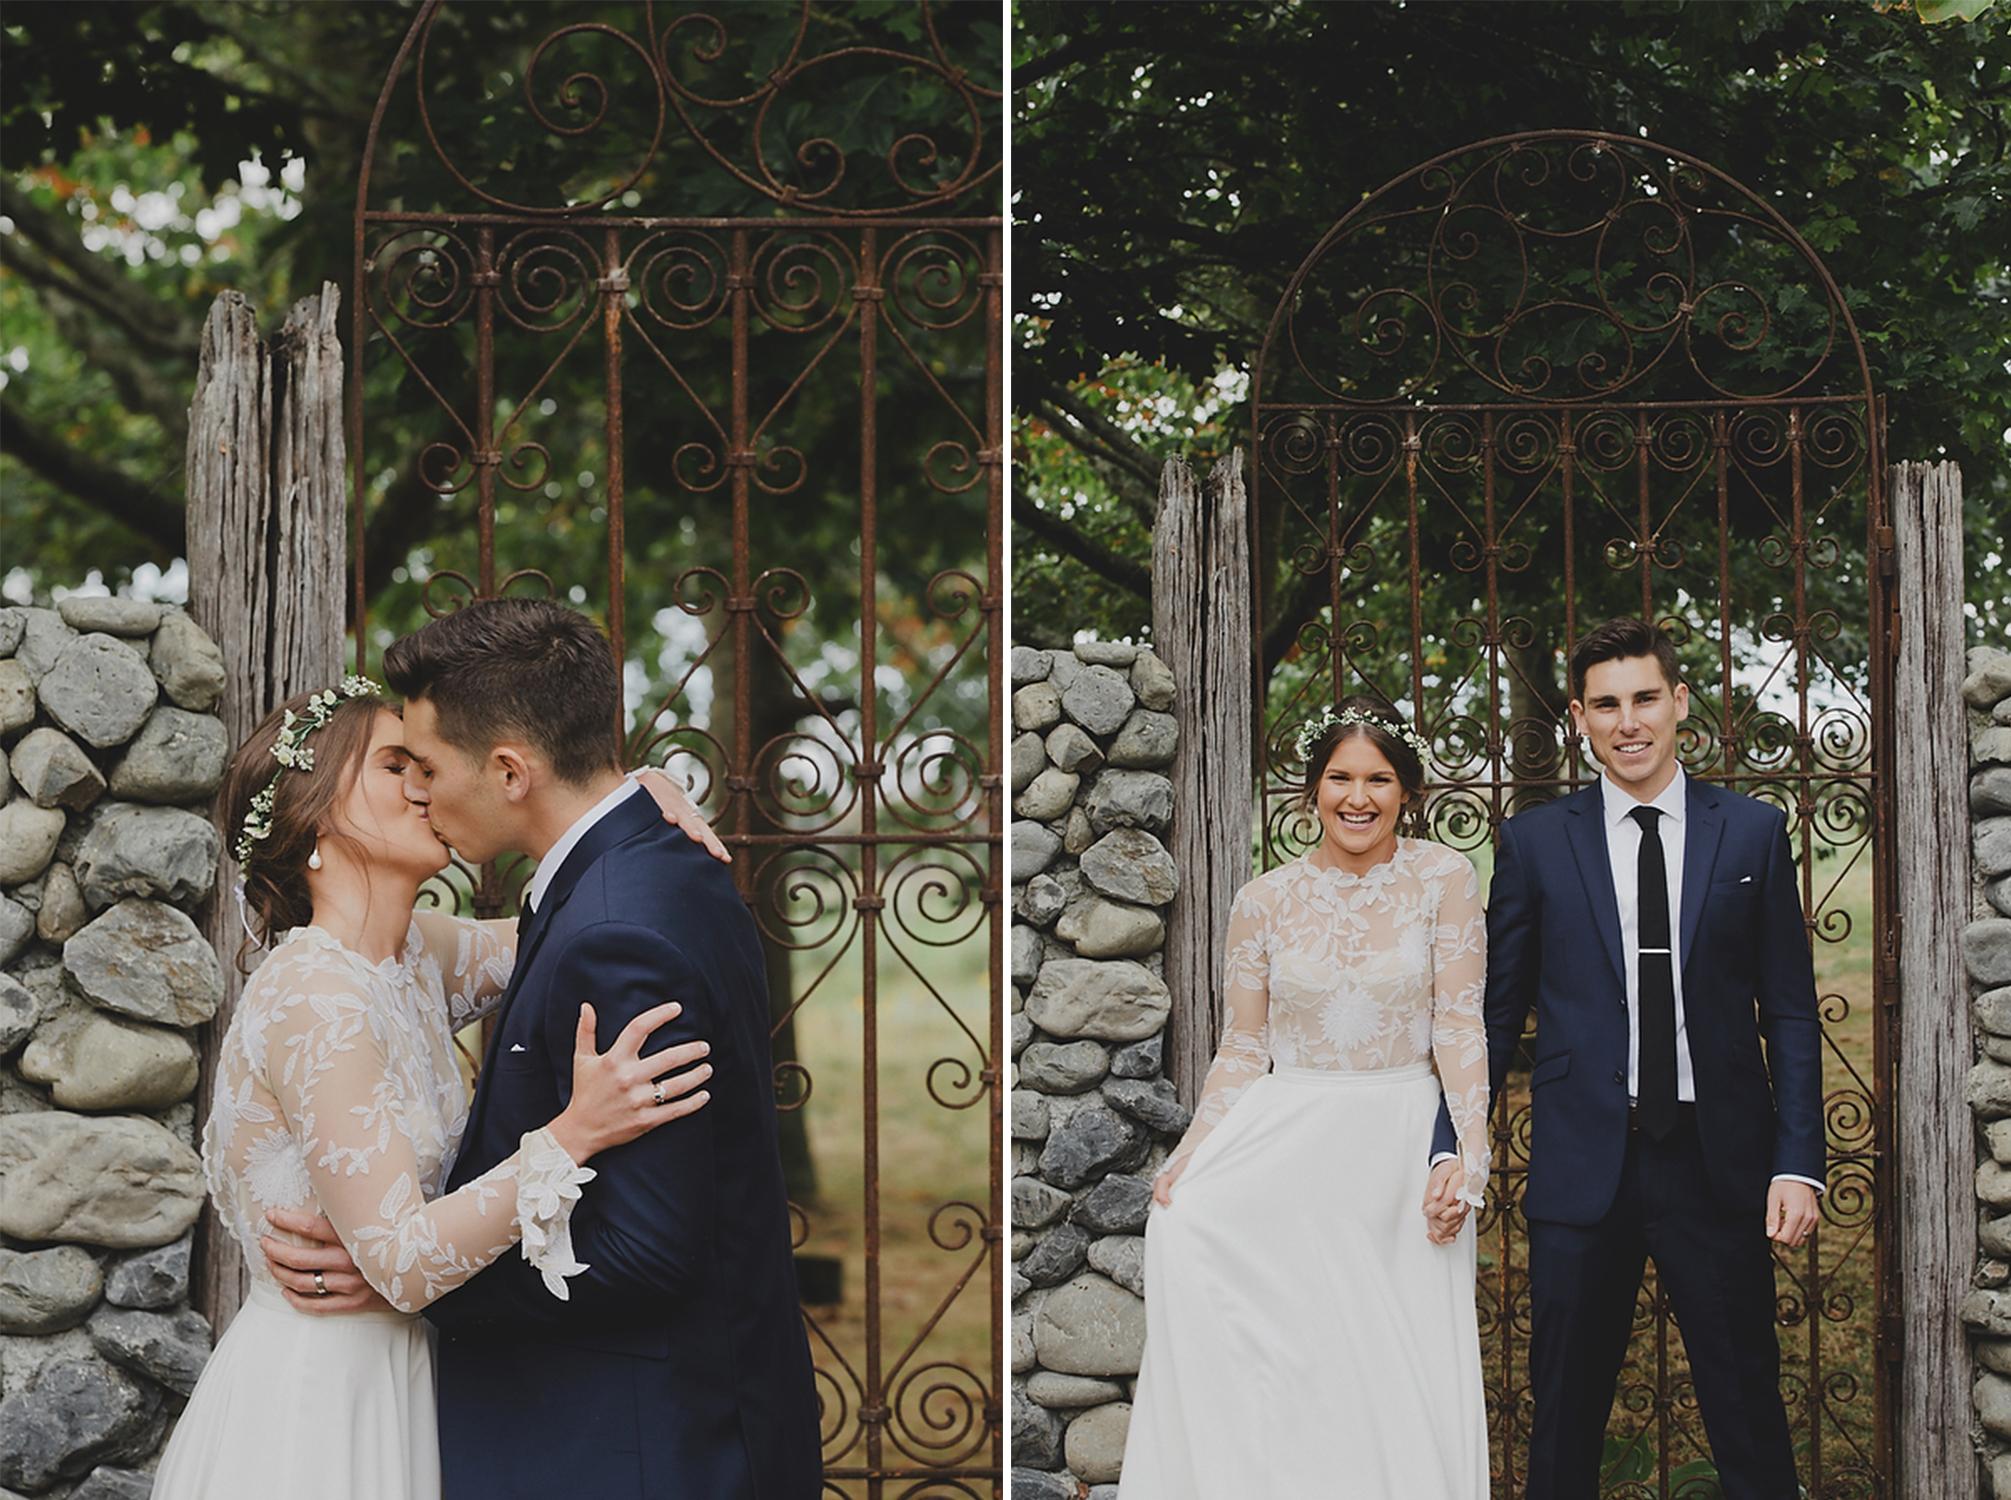 wellington wedding photography NZ - 1044.JPG